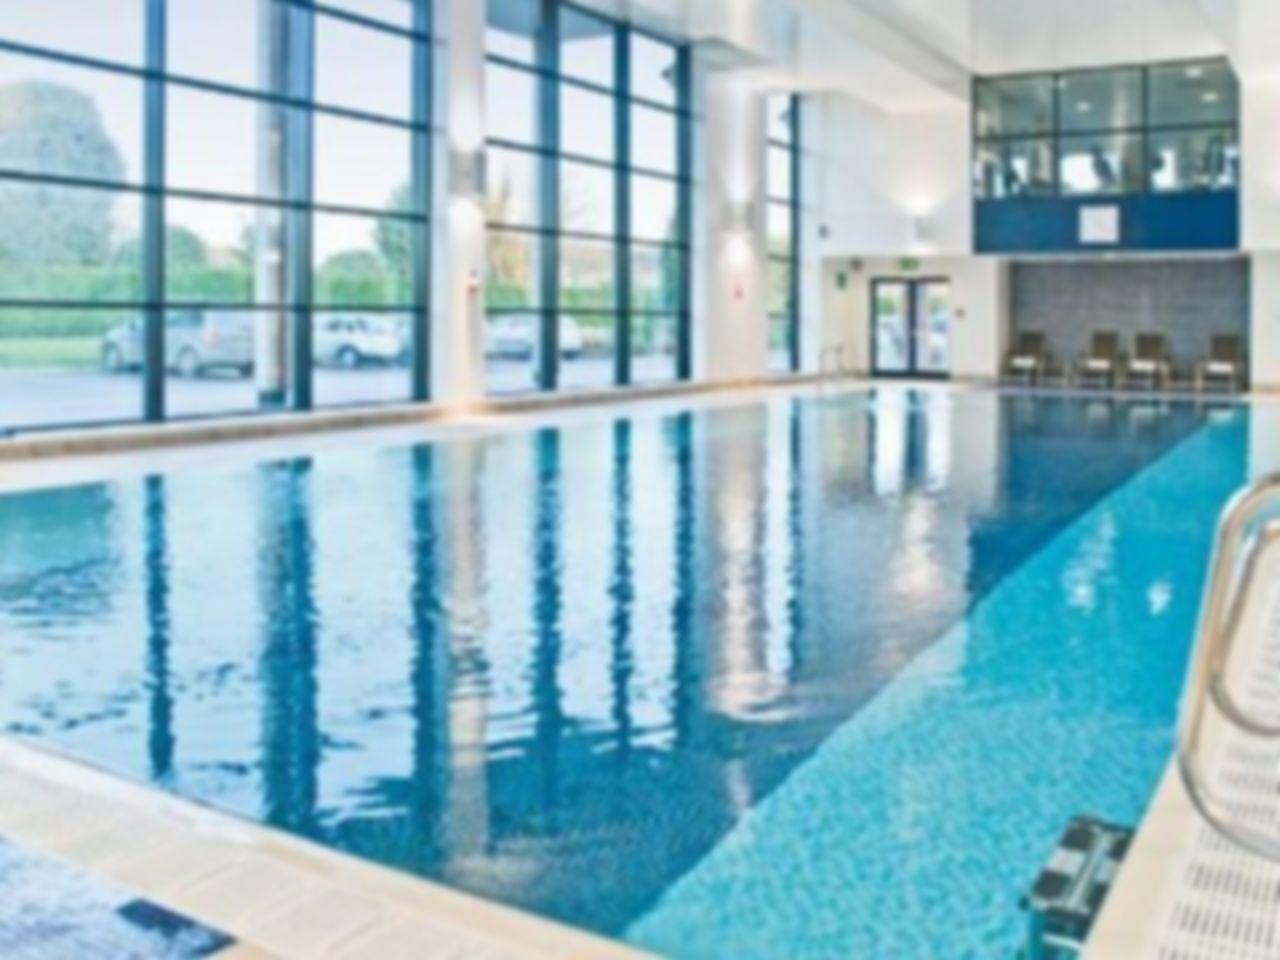 Macdonald alveston manor flexible gym passes cv37 - Stratford swimming pool opening times ...